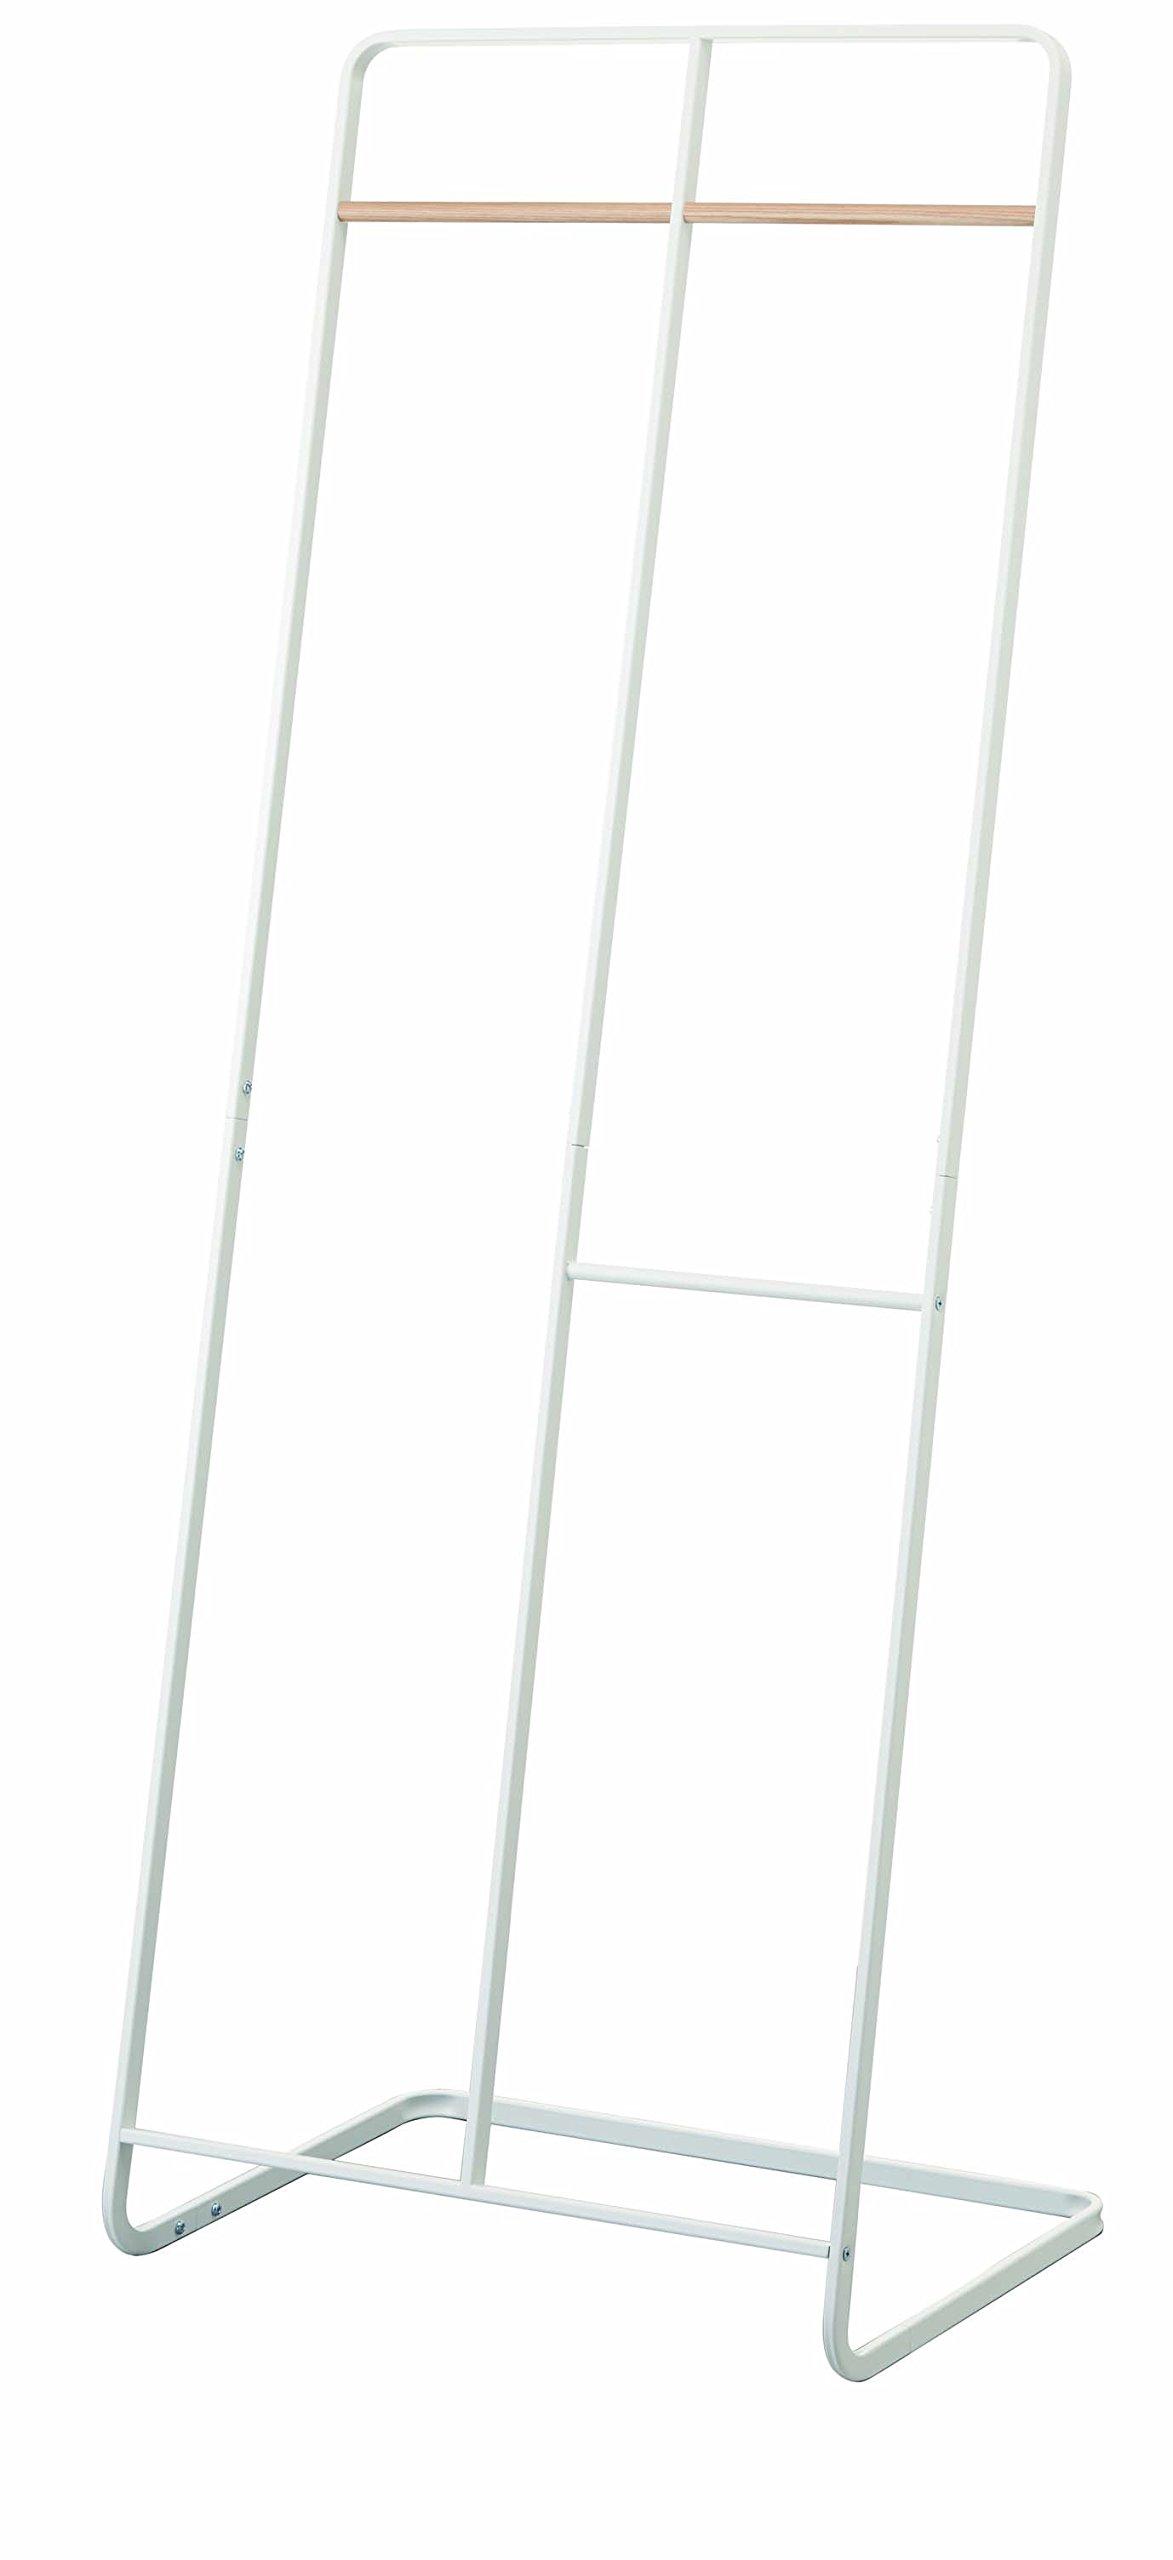 YAMAZAKI home Tower 2-Level Coat Rack, White